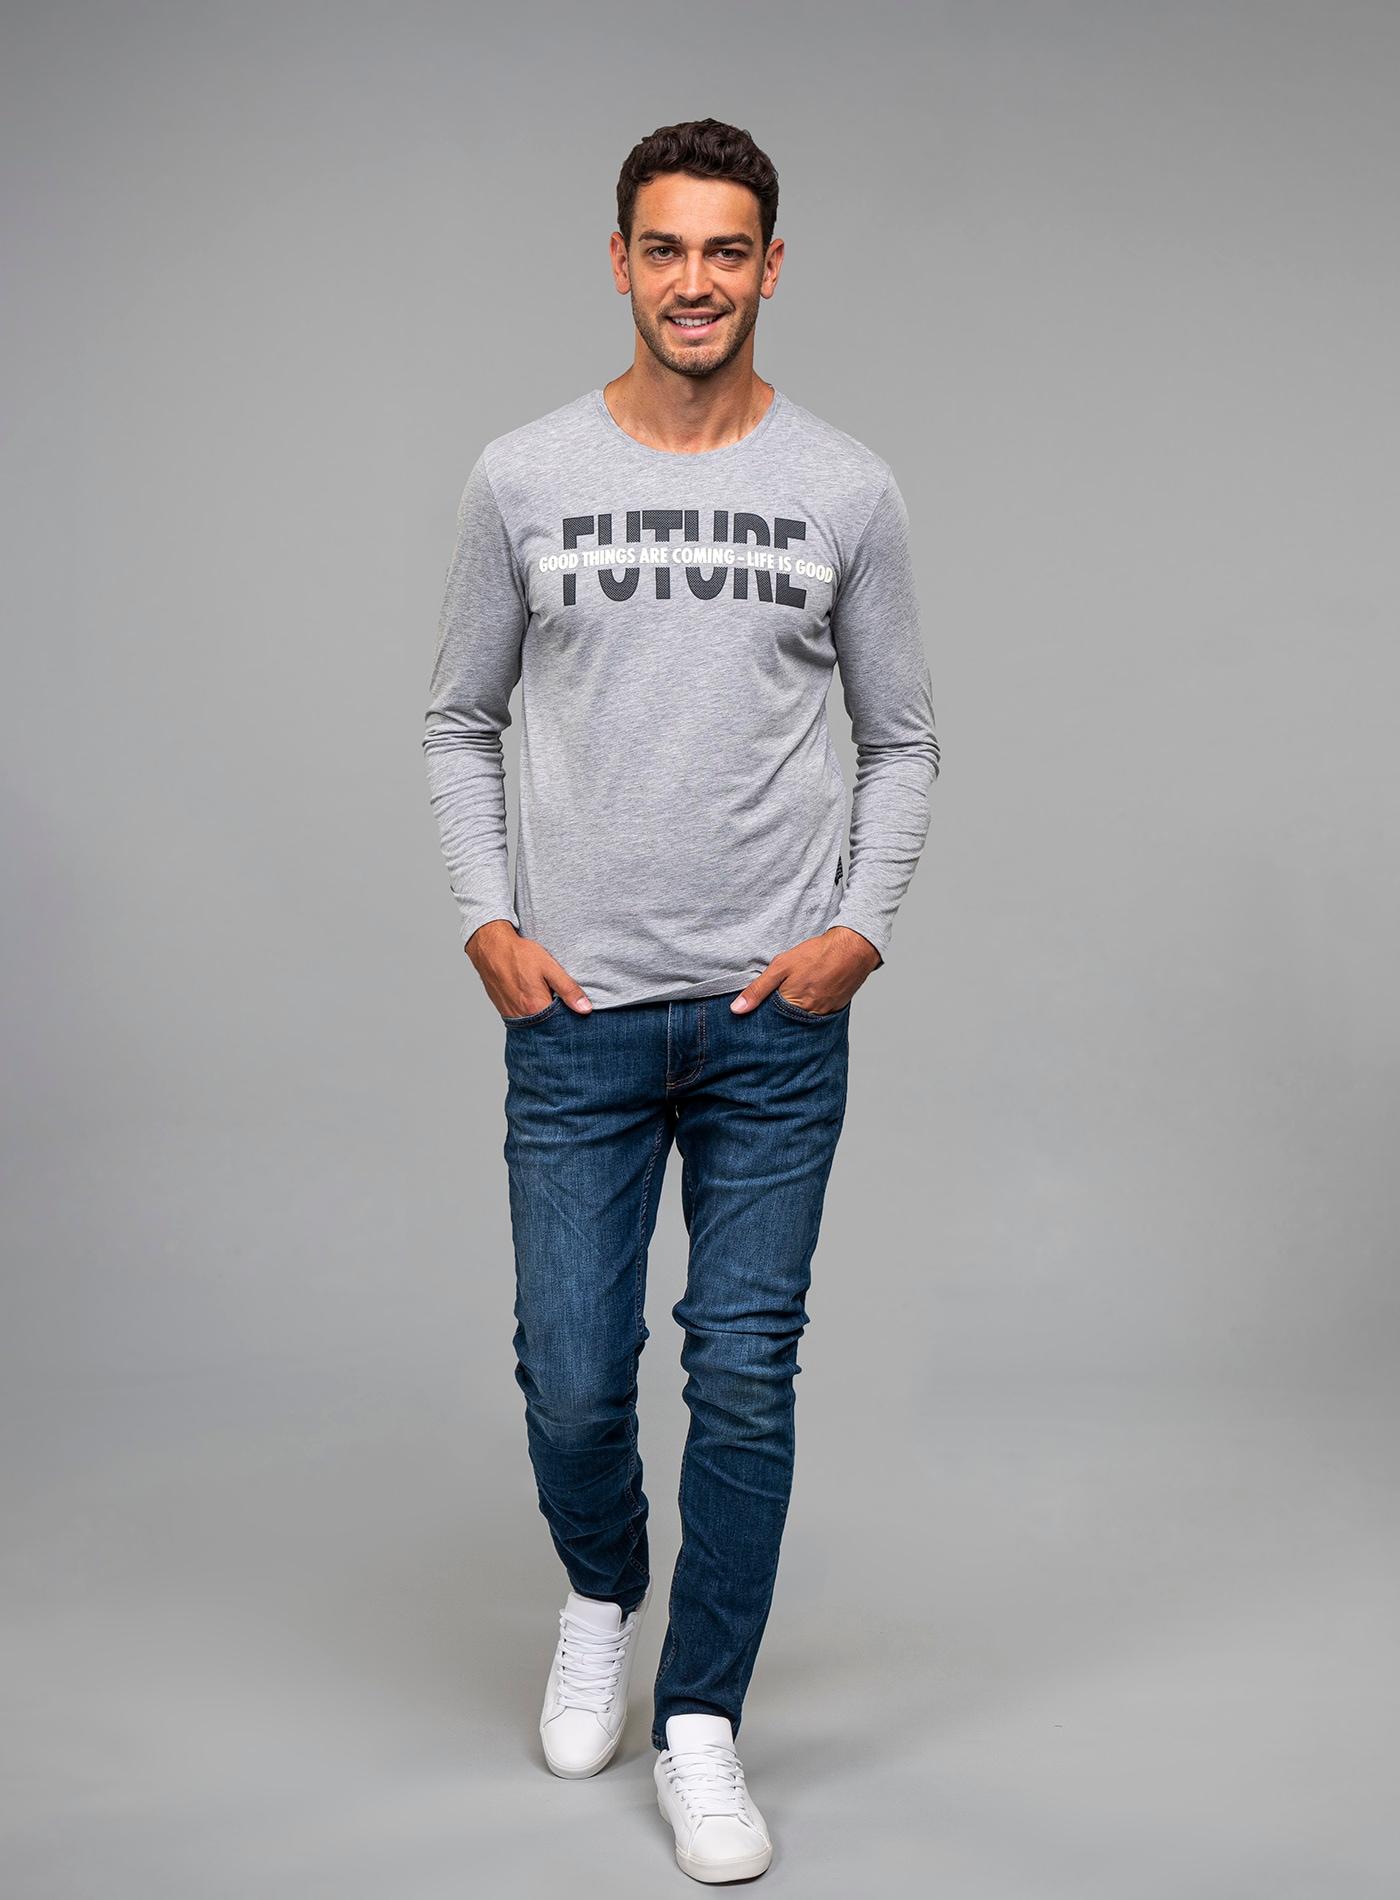 key largo -  Langarmshirt, mt modischem Frontprint